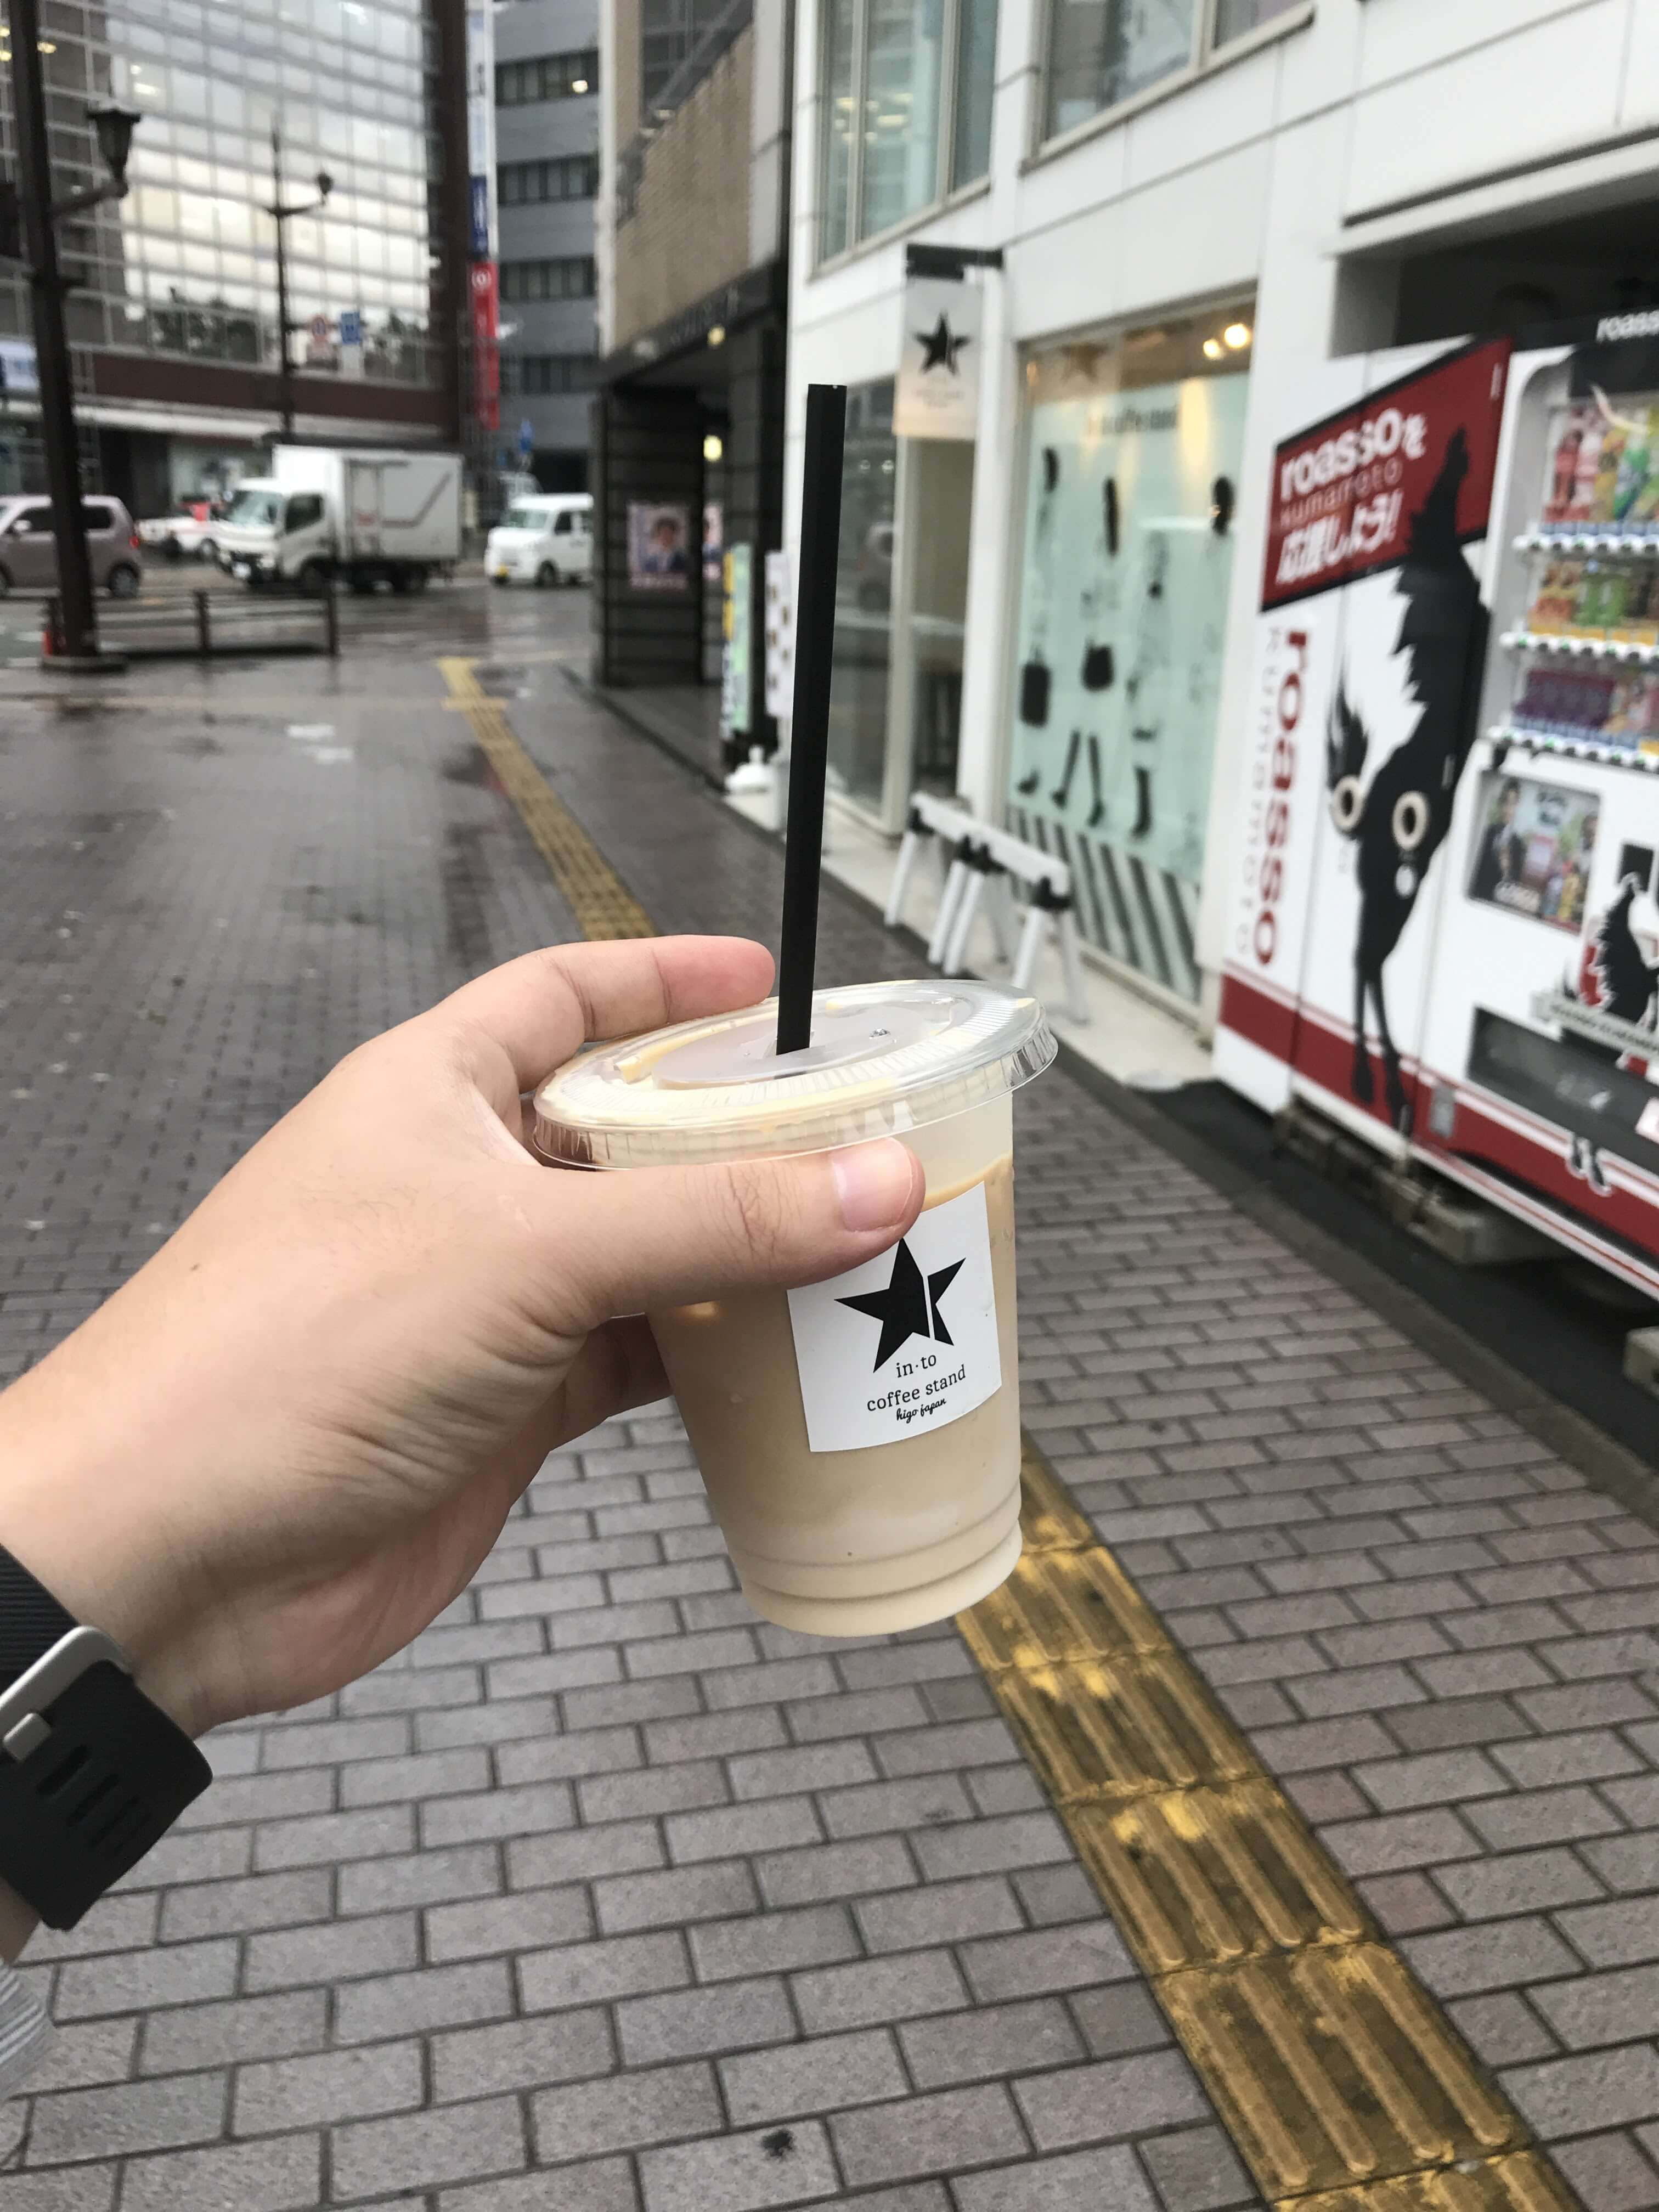 【in to coffee stand(イントゥーコーヒースタンド)】水道町角のコーヒースタンド。スッキリとしたおしゃれな店内でワッフルも。